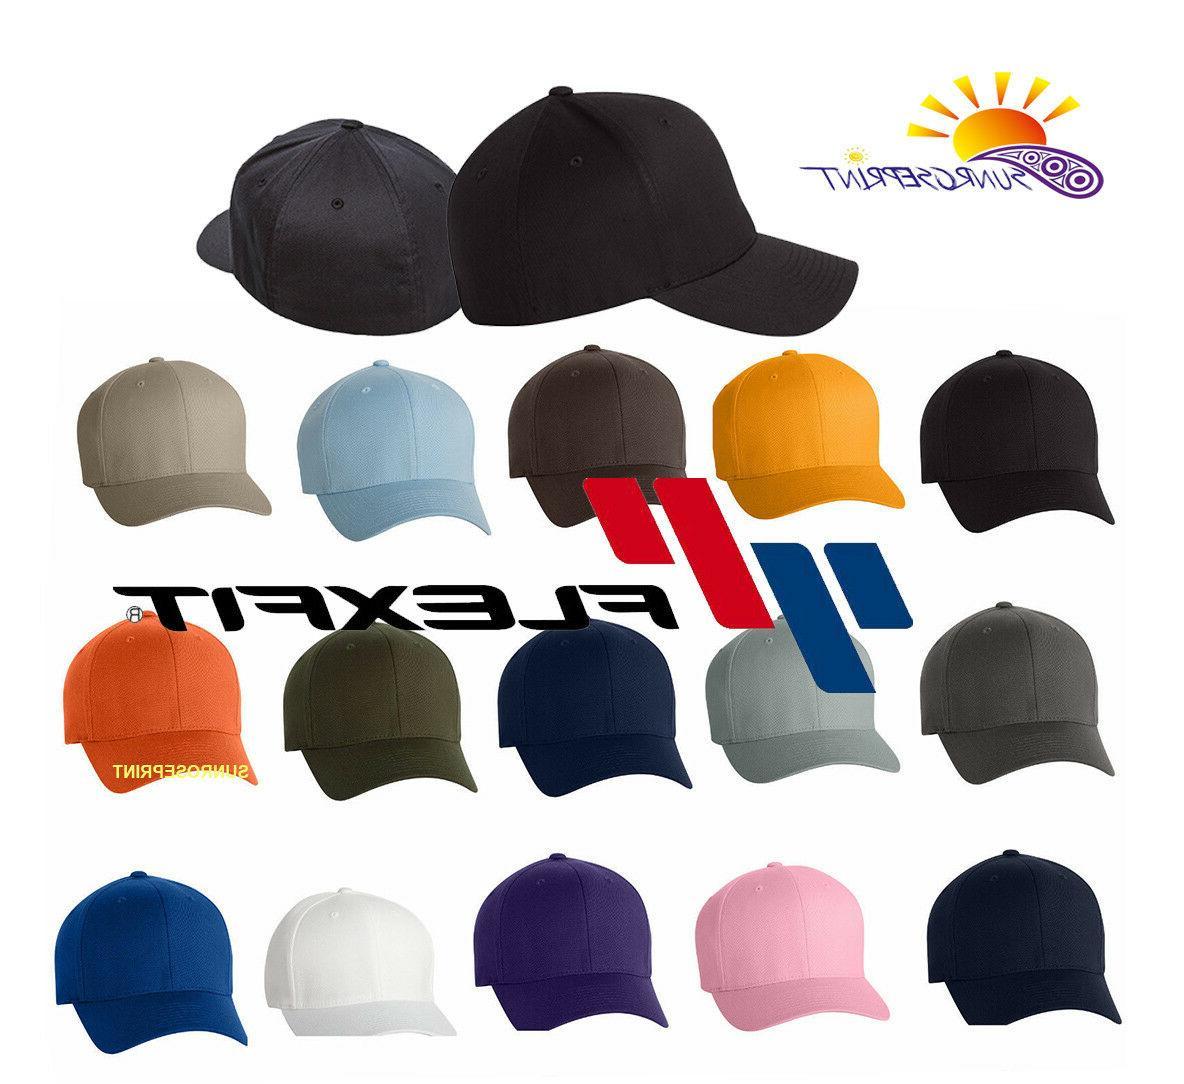 12 Classic Flexfit Blank Baseball Cap6277 Hat Wholesale Bulk